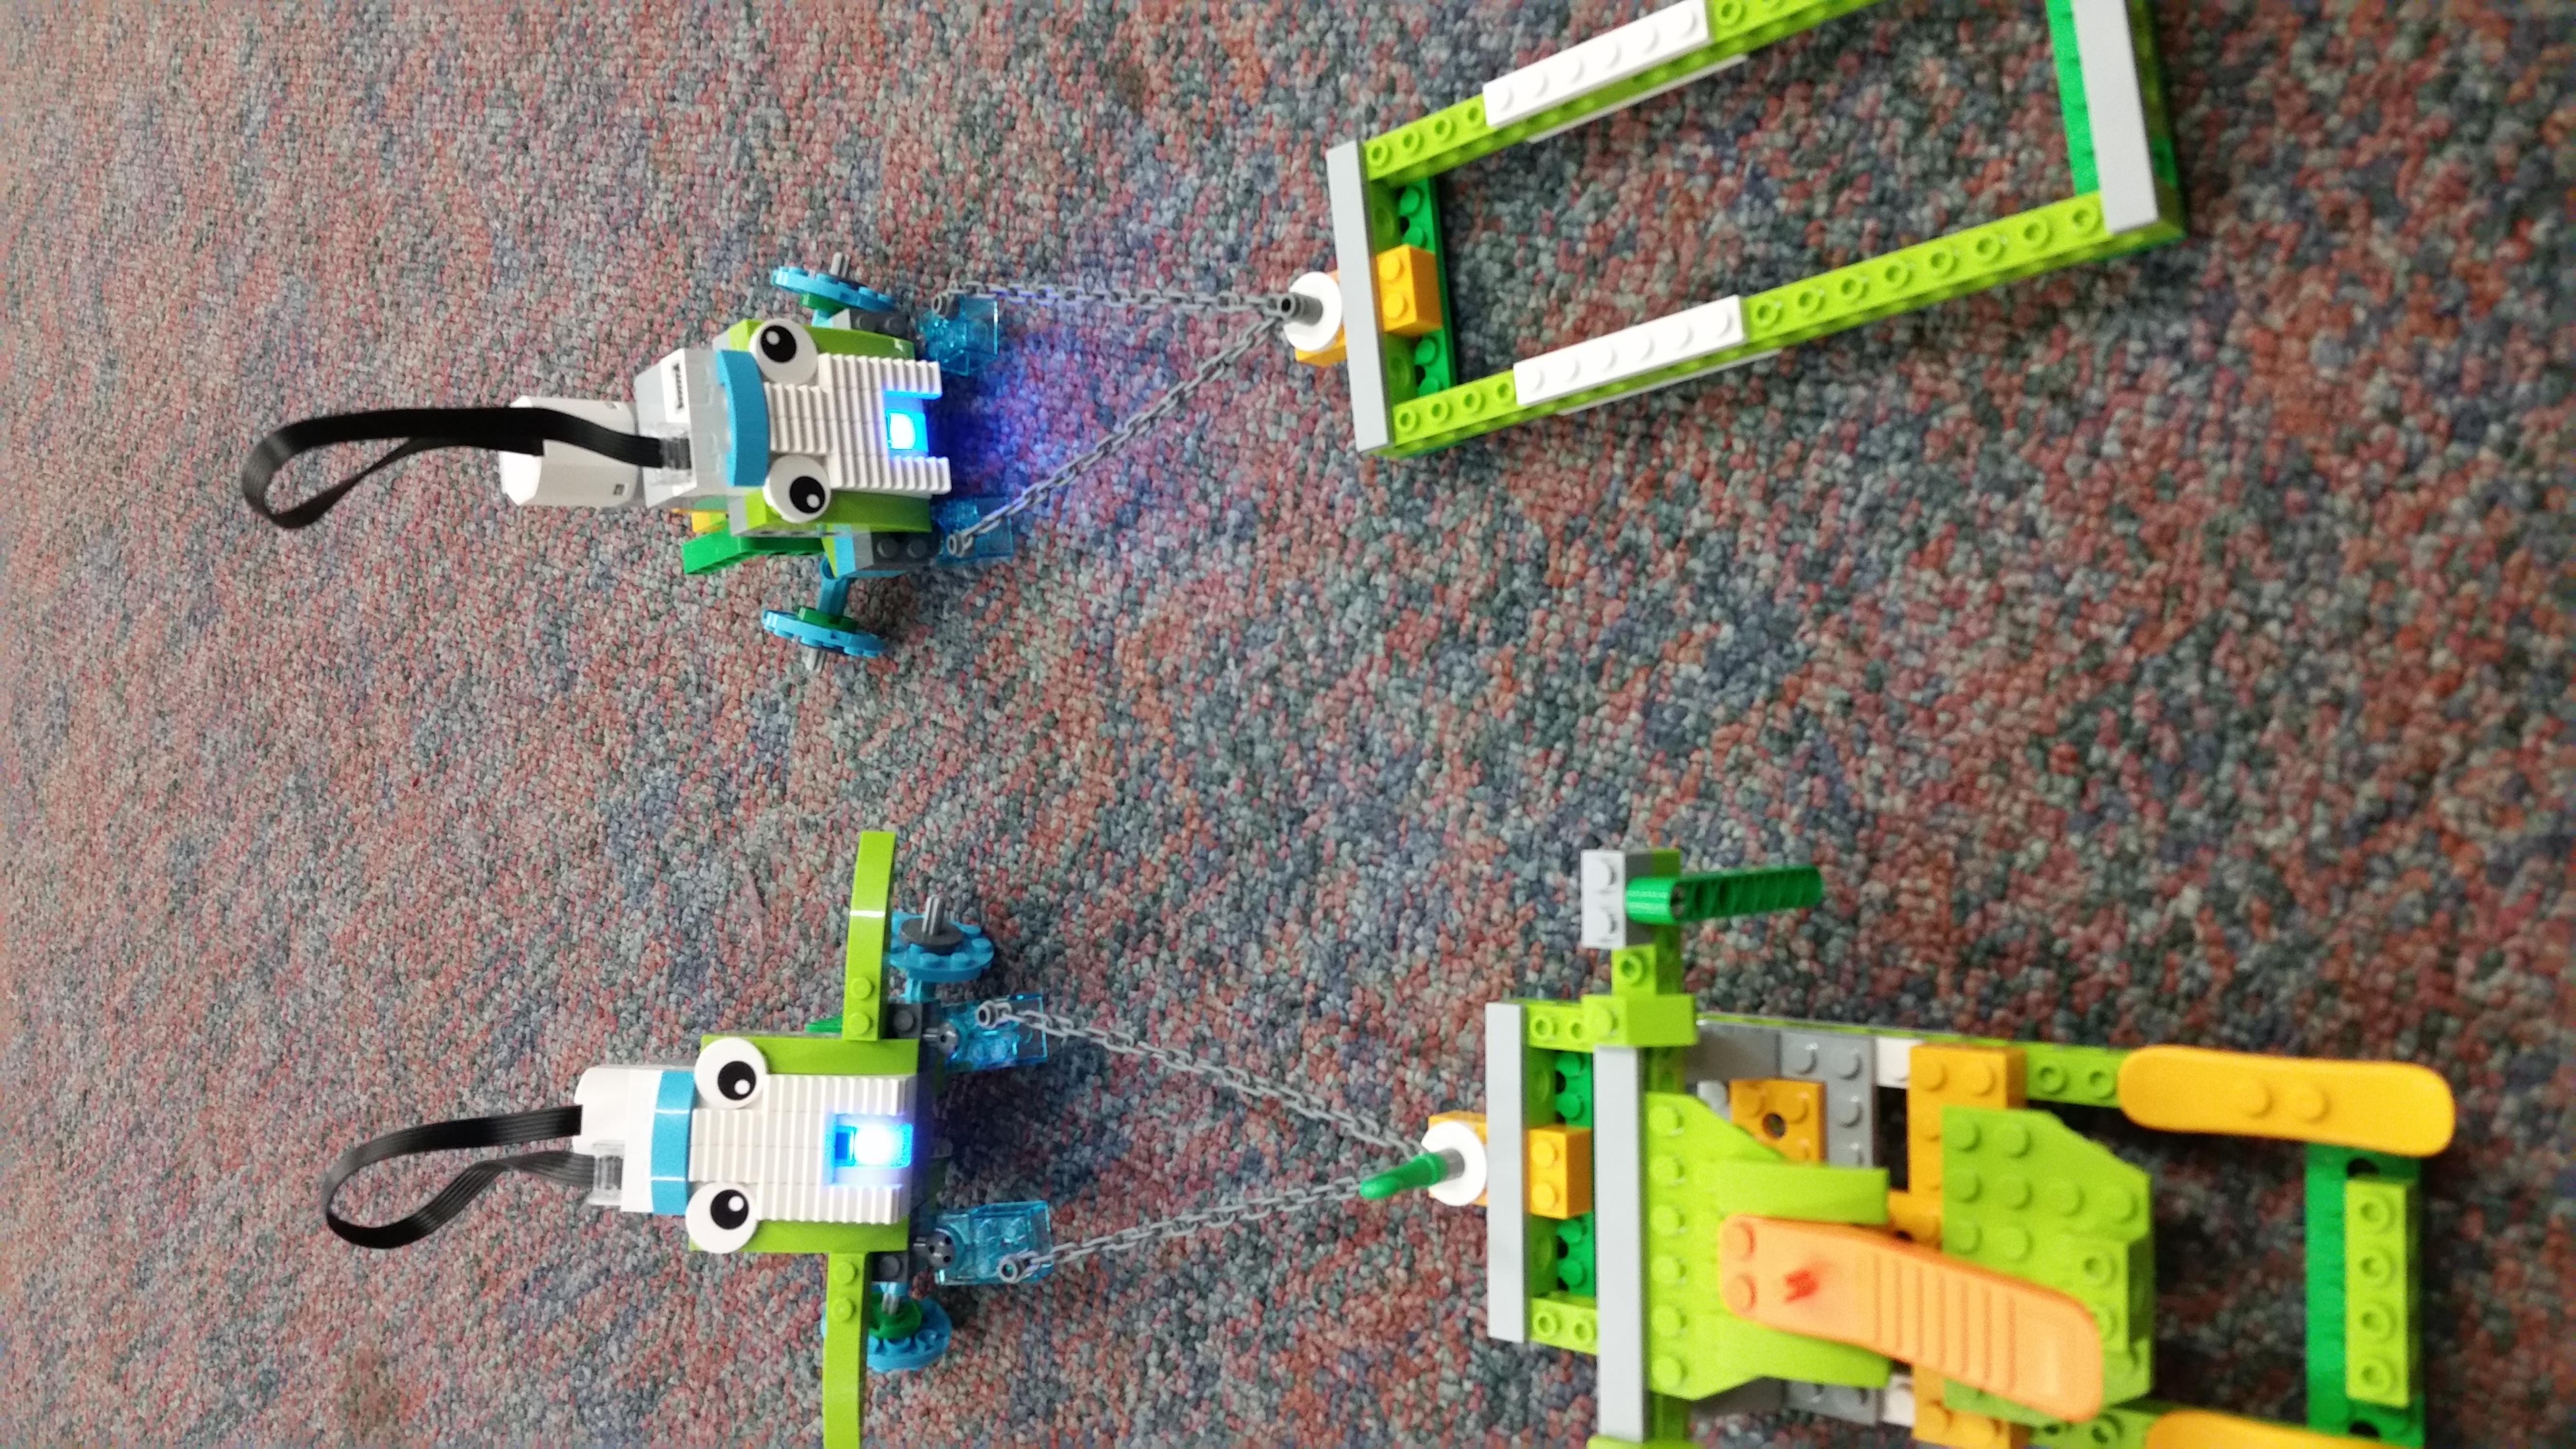 Lego Pull Bot